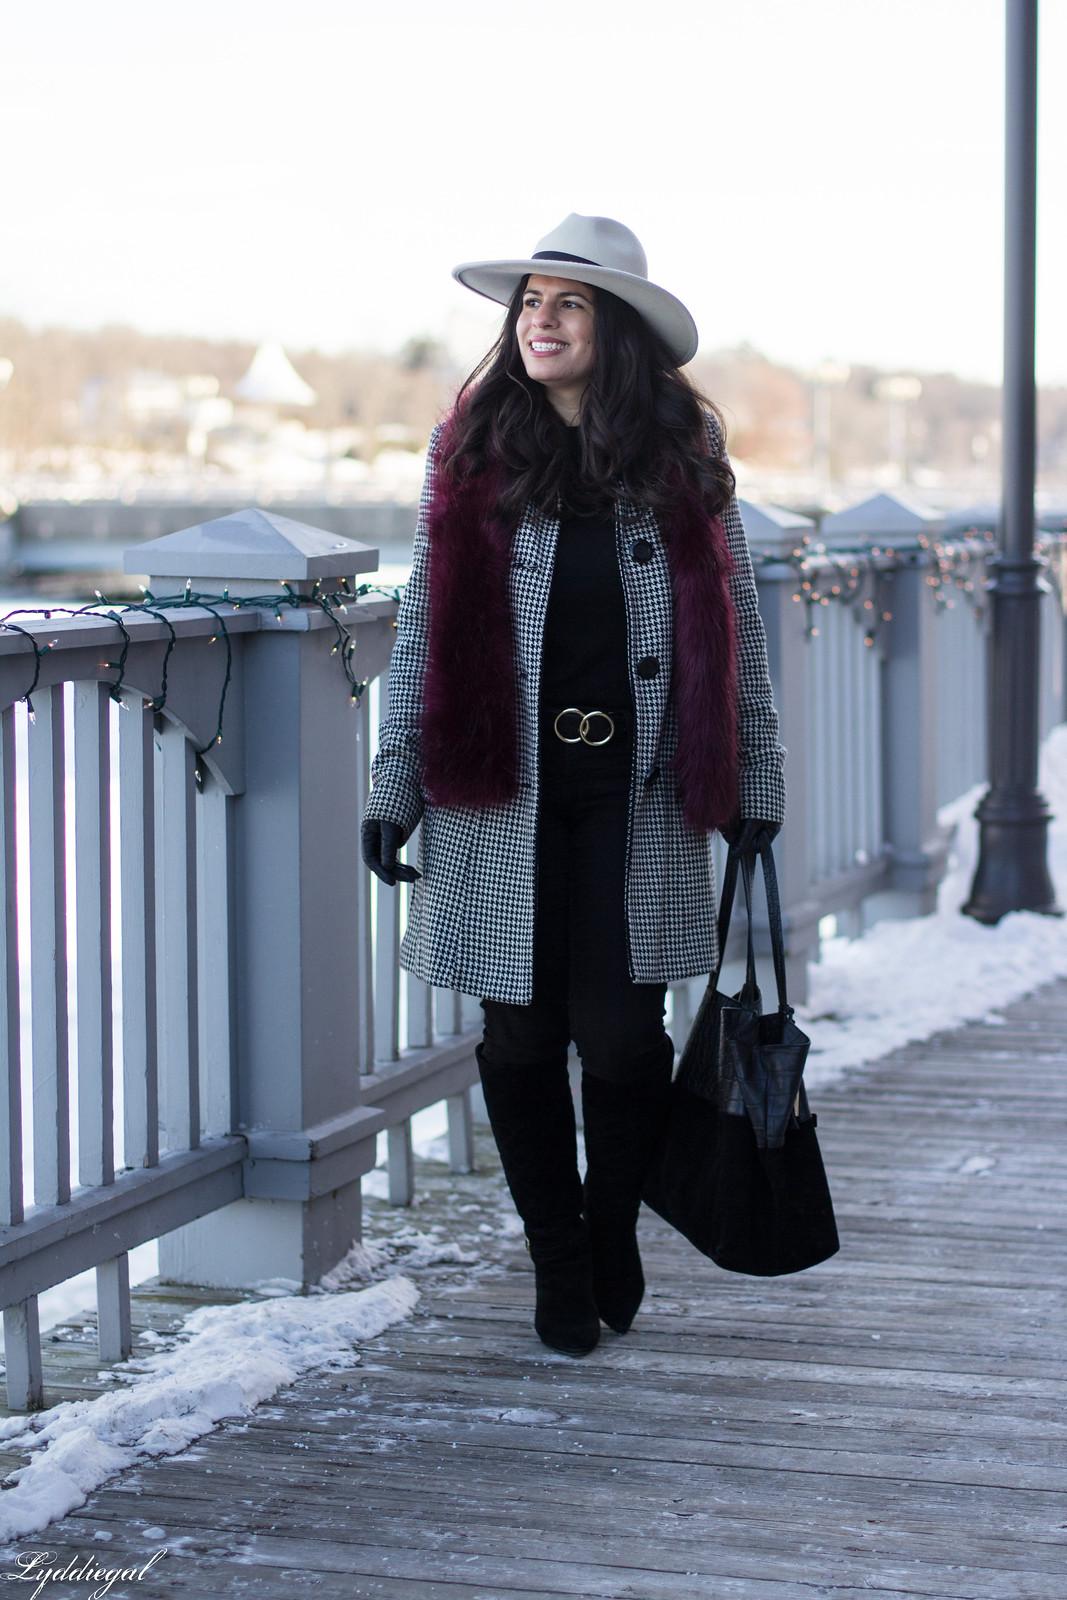 houndstooth coat, boots, wide brim fedora, fur scarf-8.jpg